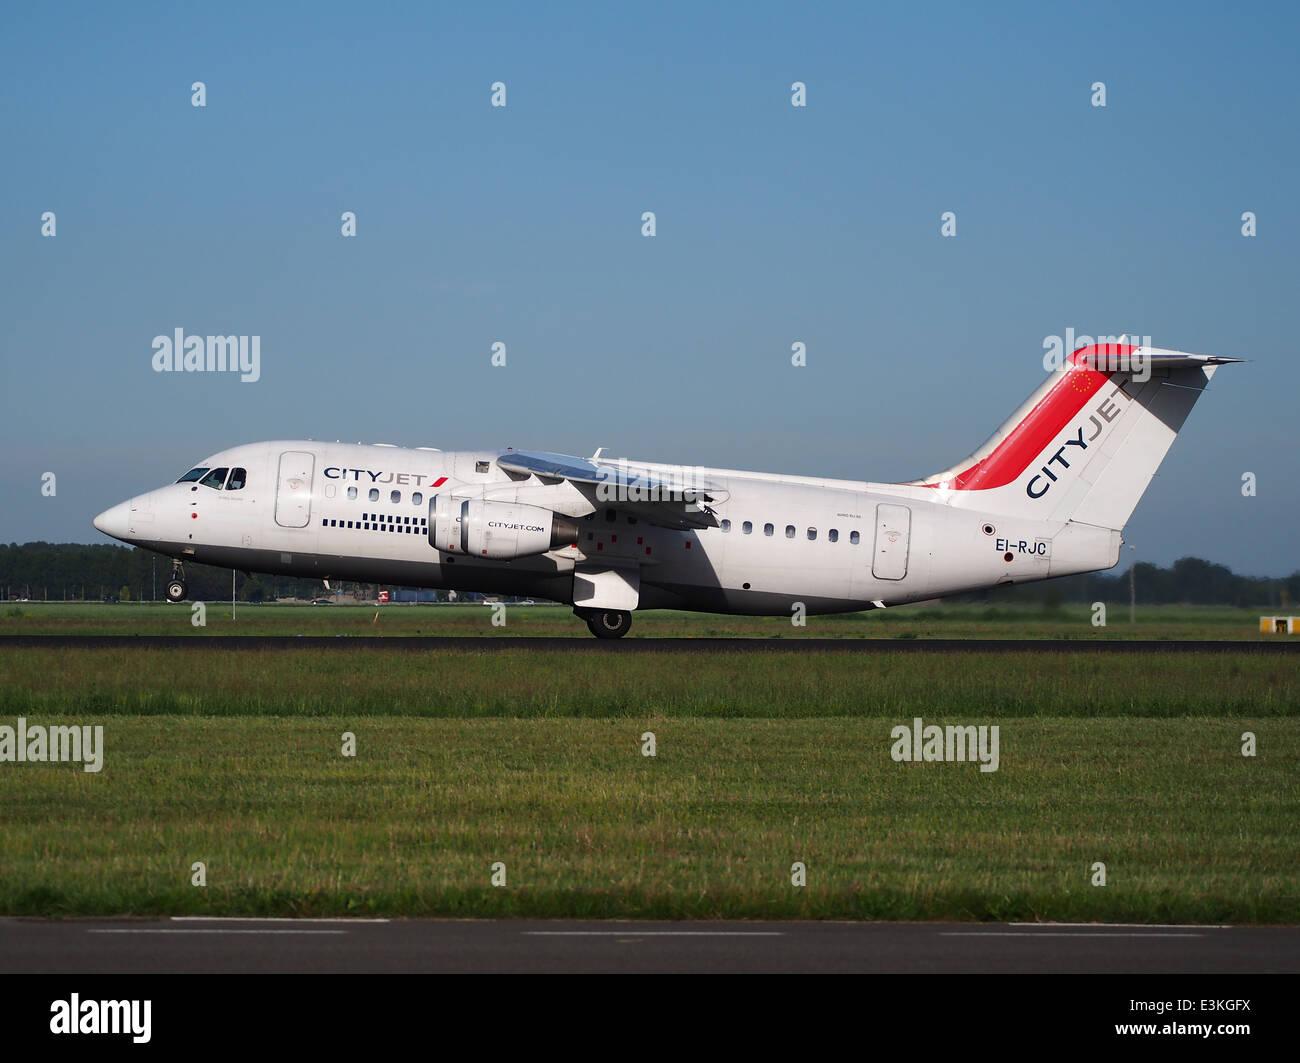 EI-RJC Cityjet British Aerospace Avro RJ85 takeoff from Schiphol (AMS - EHAM), The Netherlands, 11june2014, pic - Stock Image